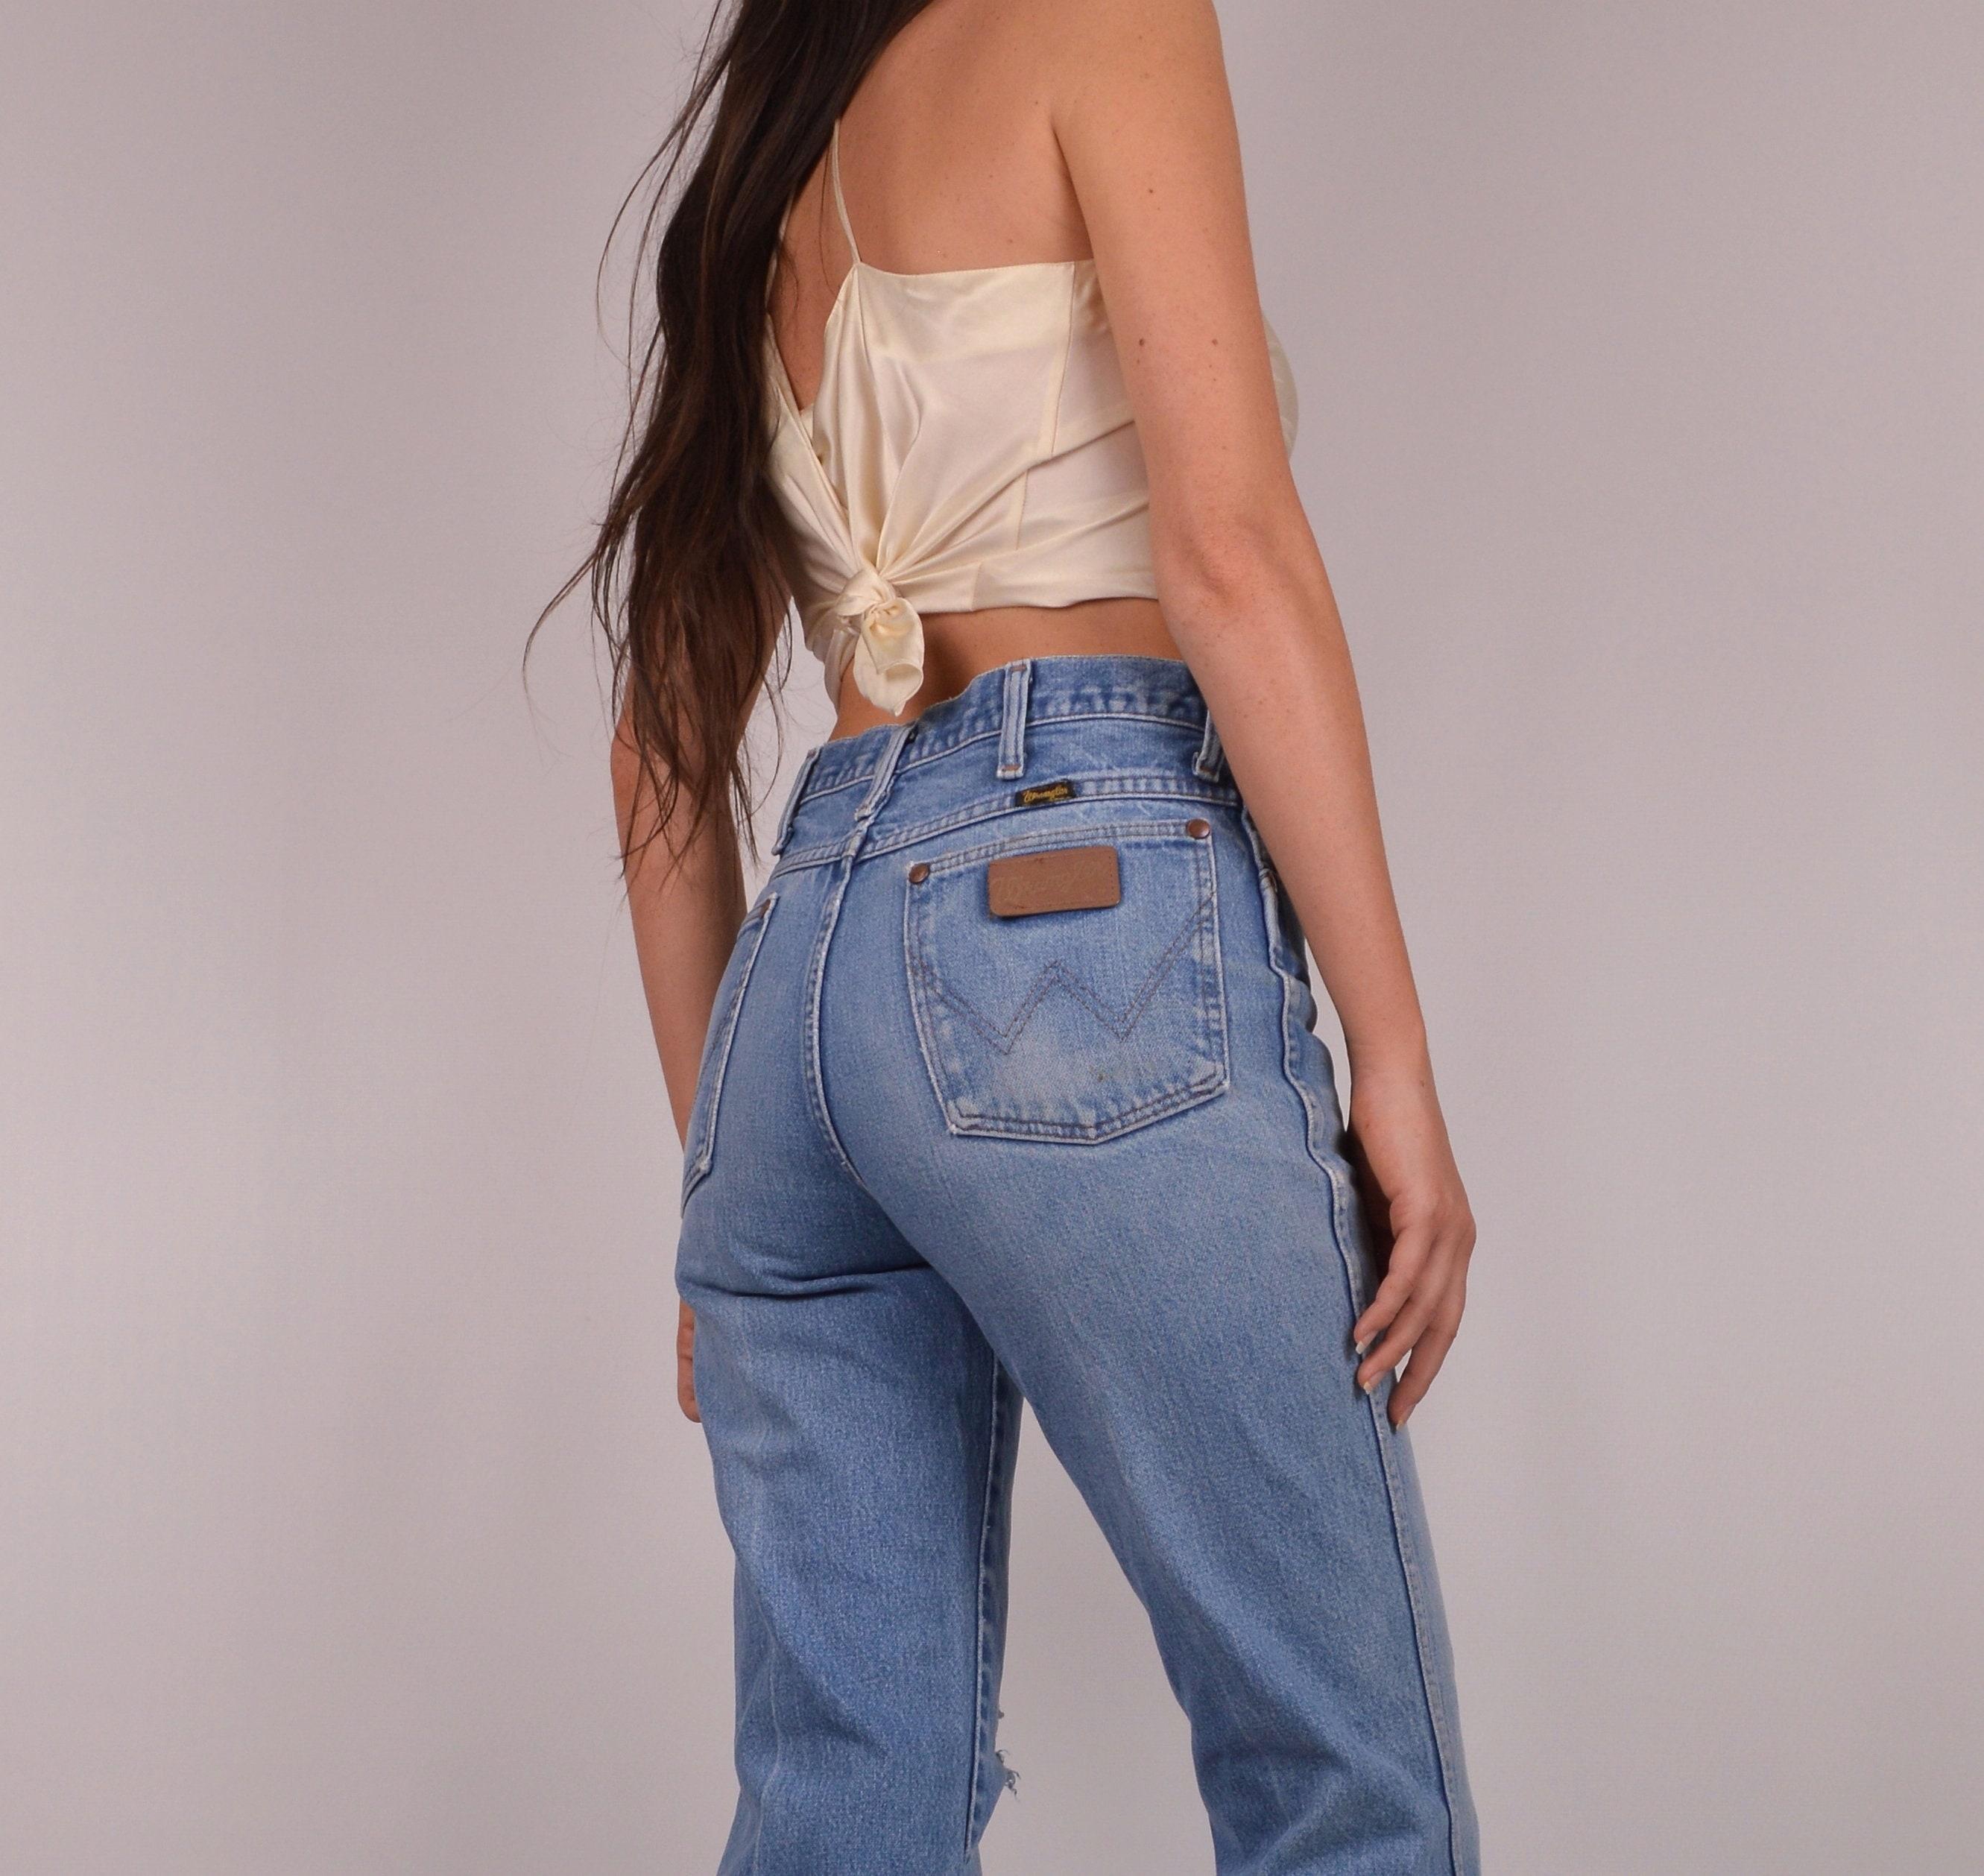 d582e6f5 Vintage Wrangler Jeans / Sz 2 to 4